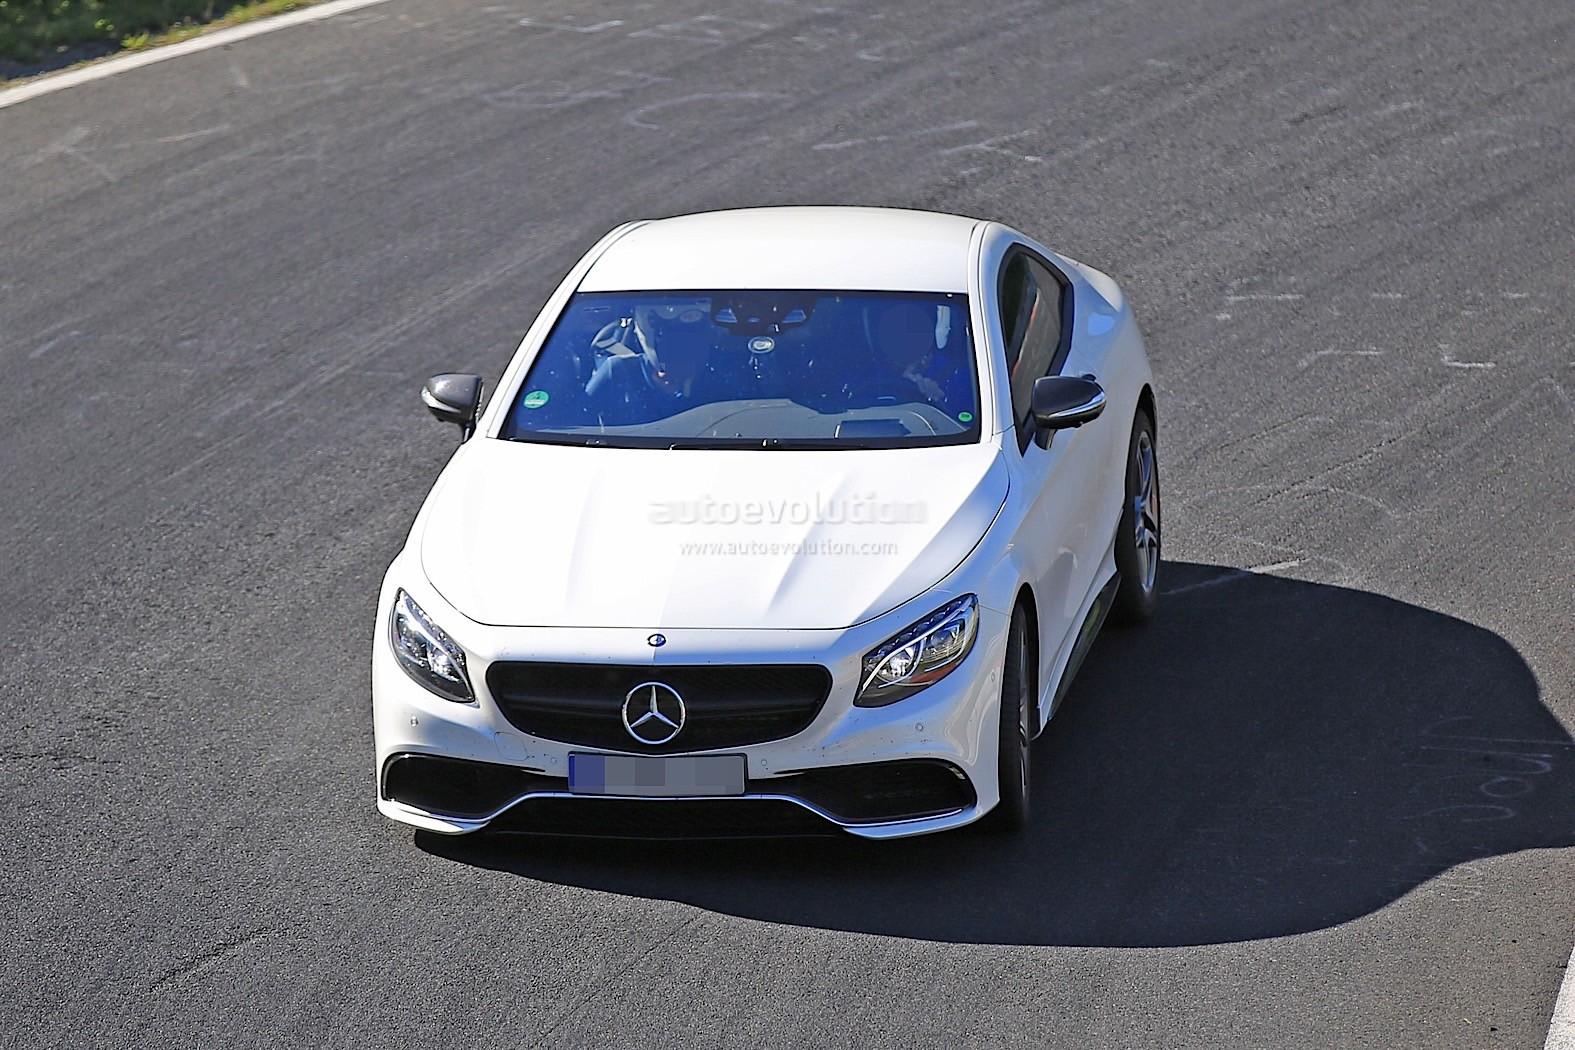 2019 Sl Mercedes >> 2019 Mercedes-Benz SL Prototype Returns, Looks Like an S-Class Coupe Hot Rod - autoevolution